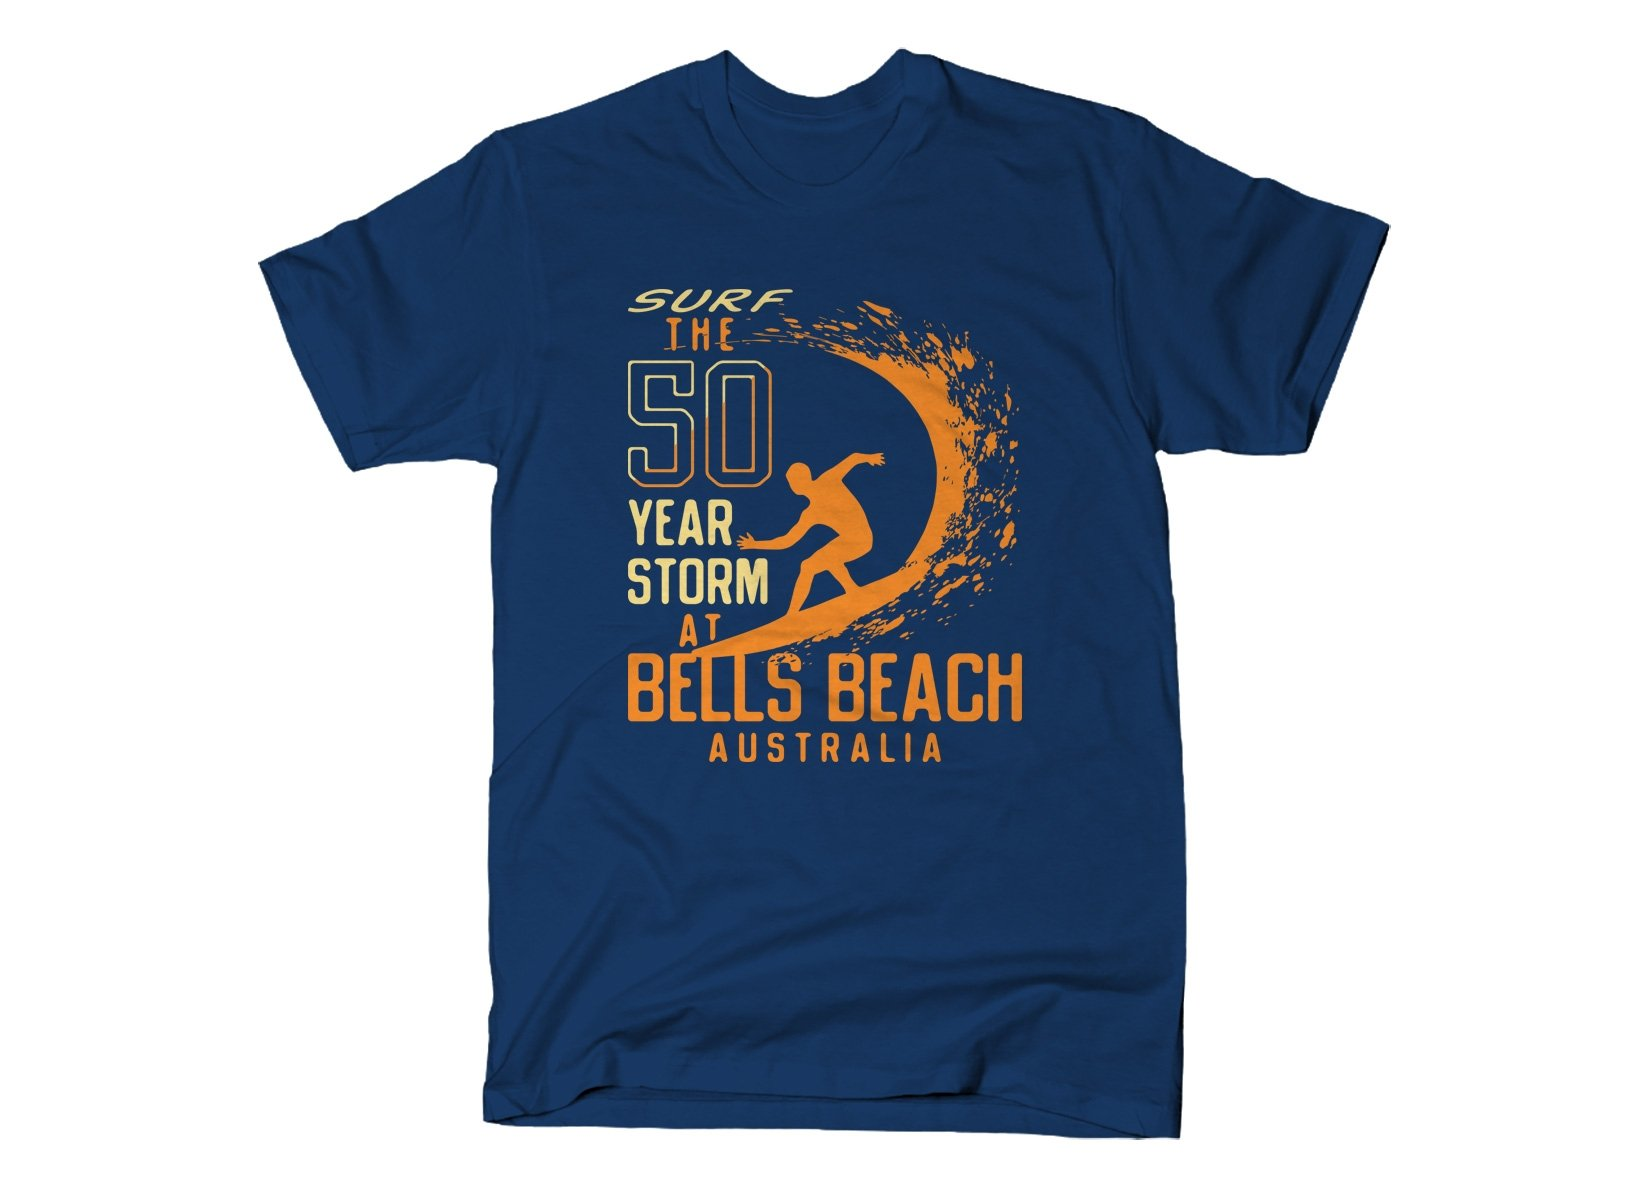 50 Year Storm At Bells Beach